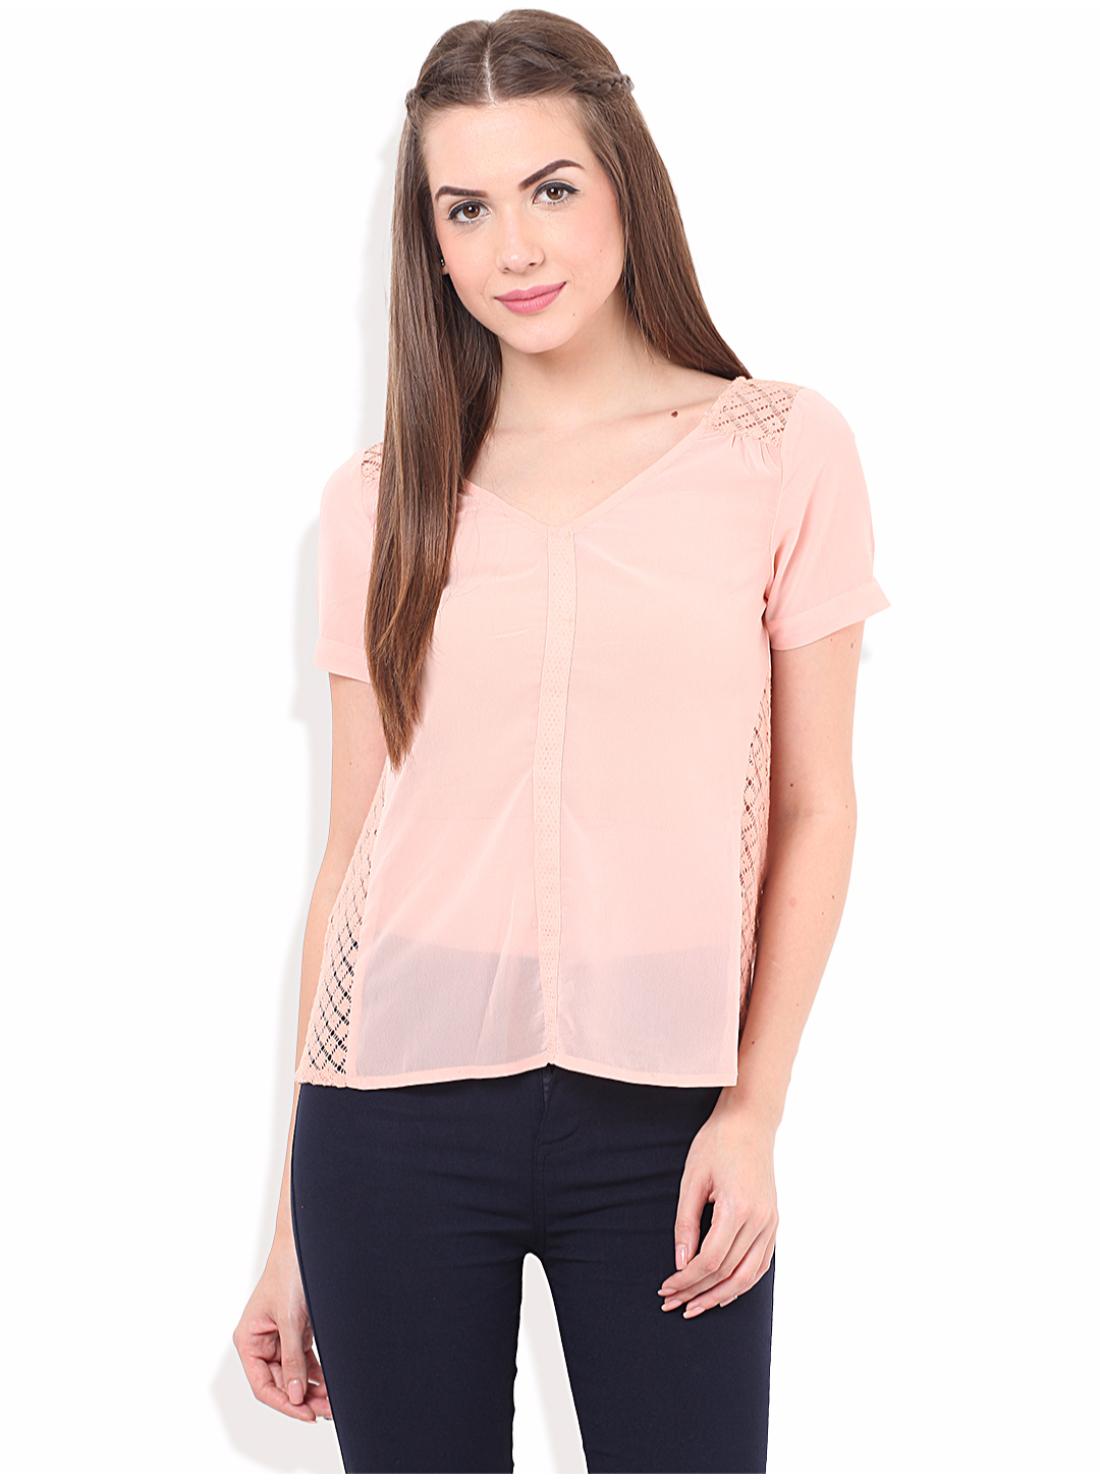 Porsorte   PORSORTE Women's  Polyester Solid Pink Top